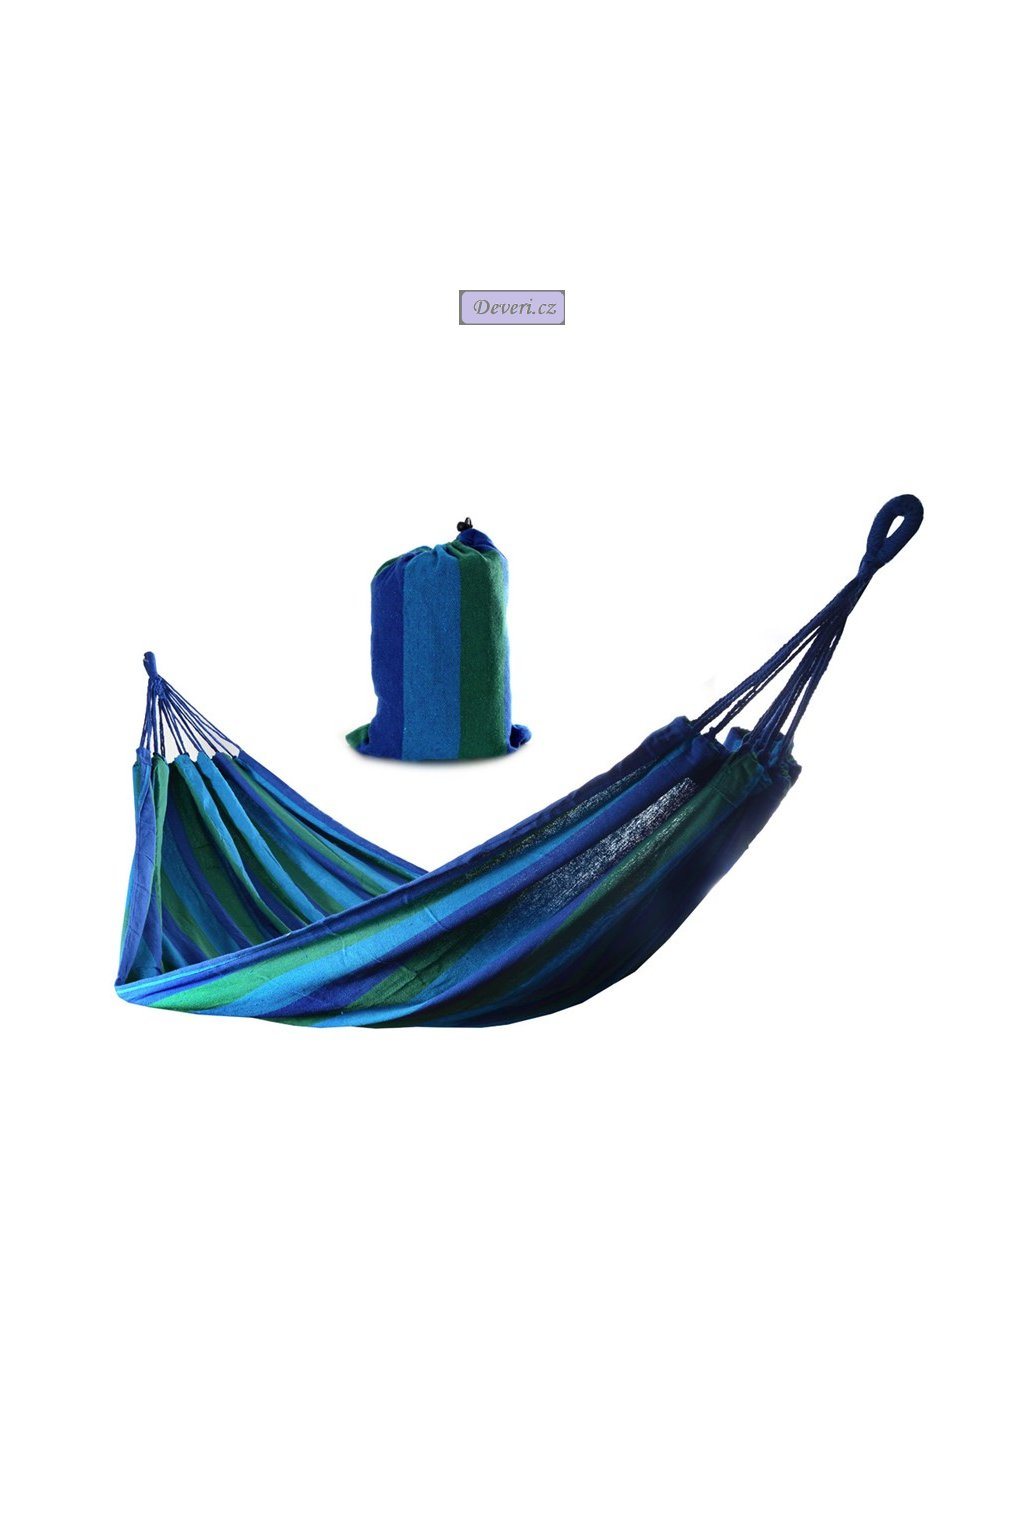 200x85cm zeleno modrá +taška